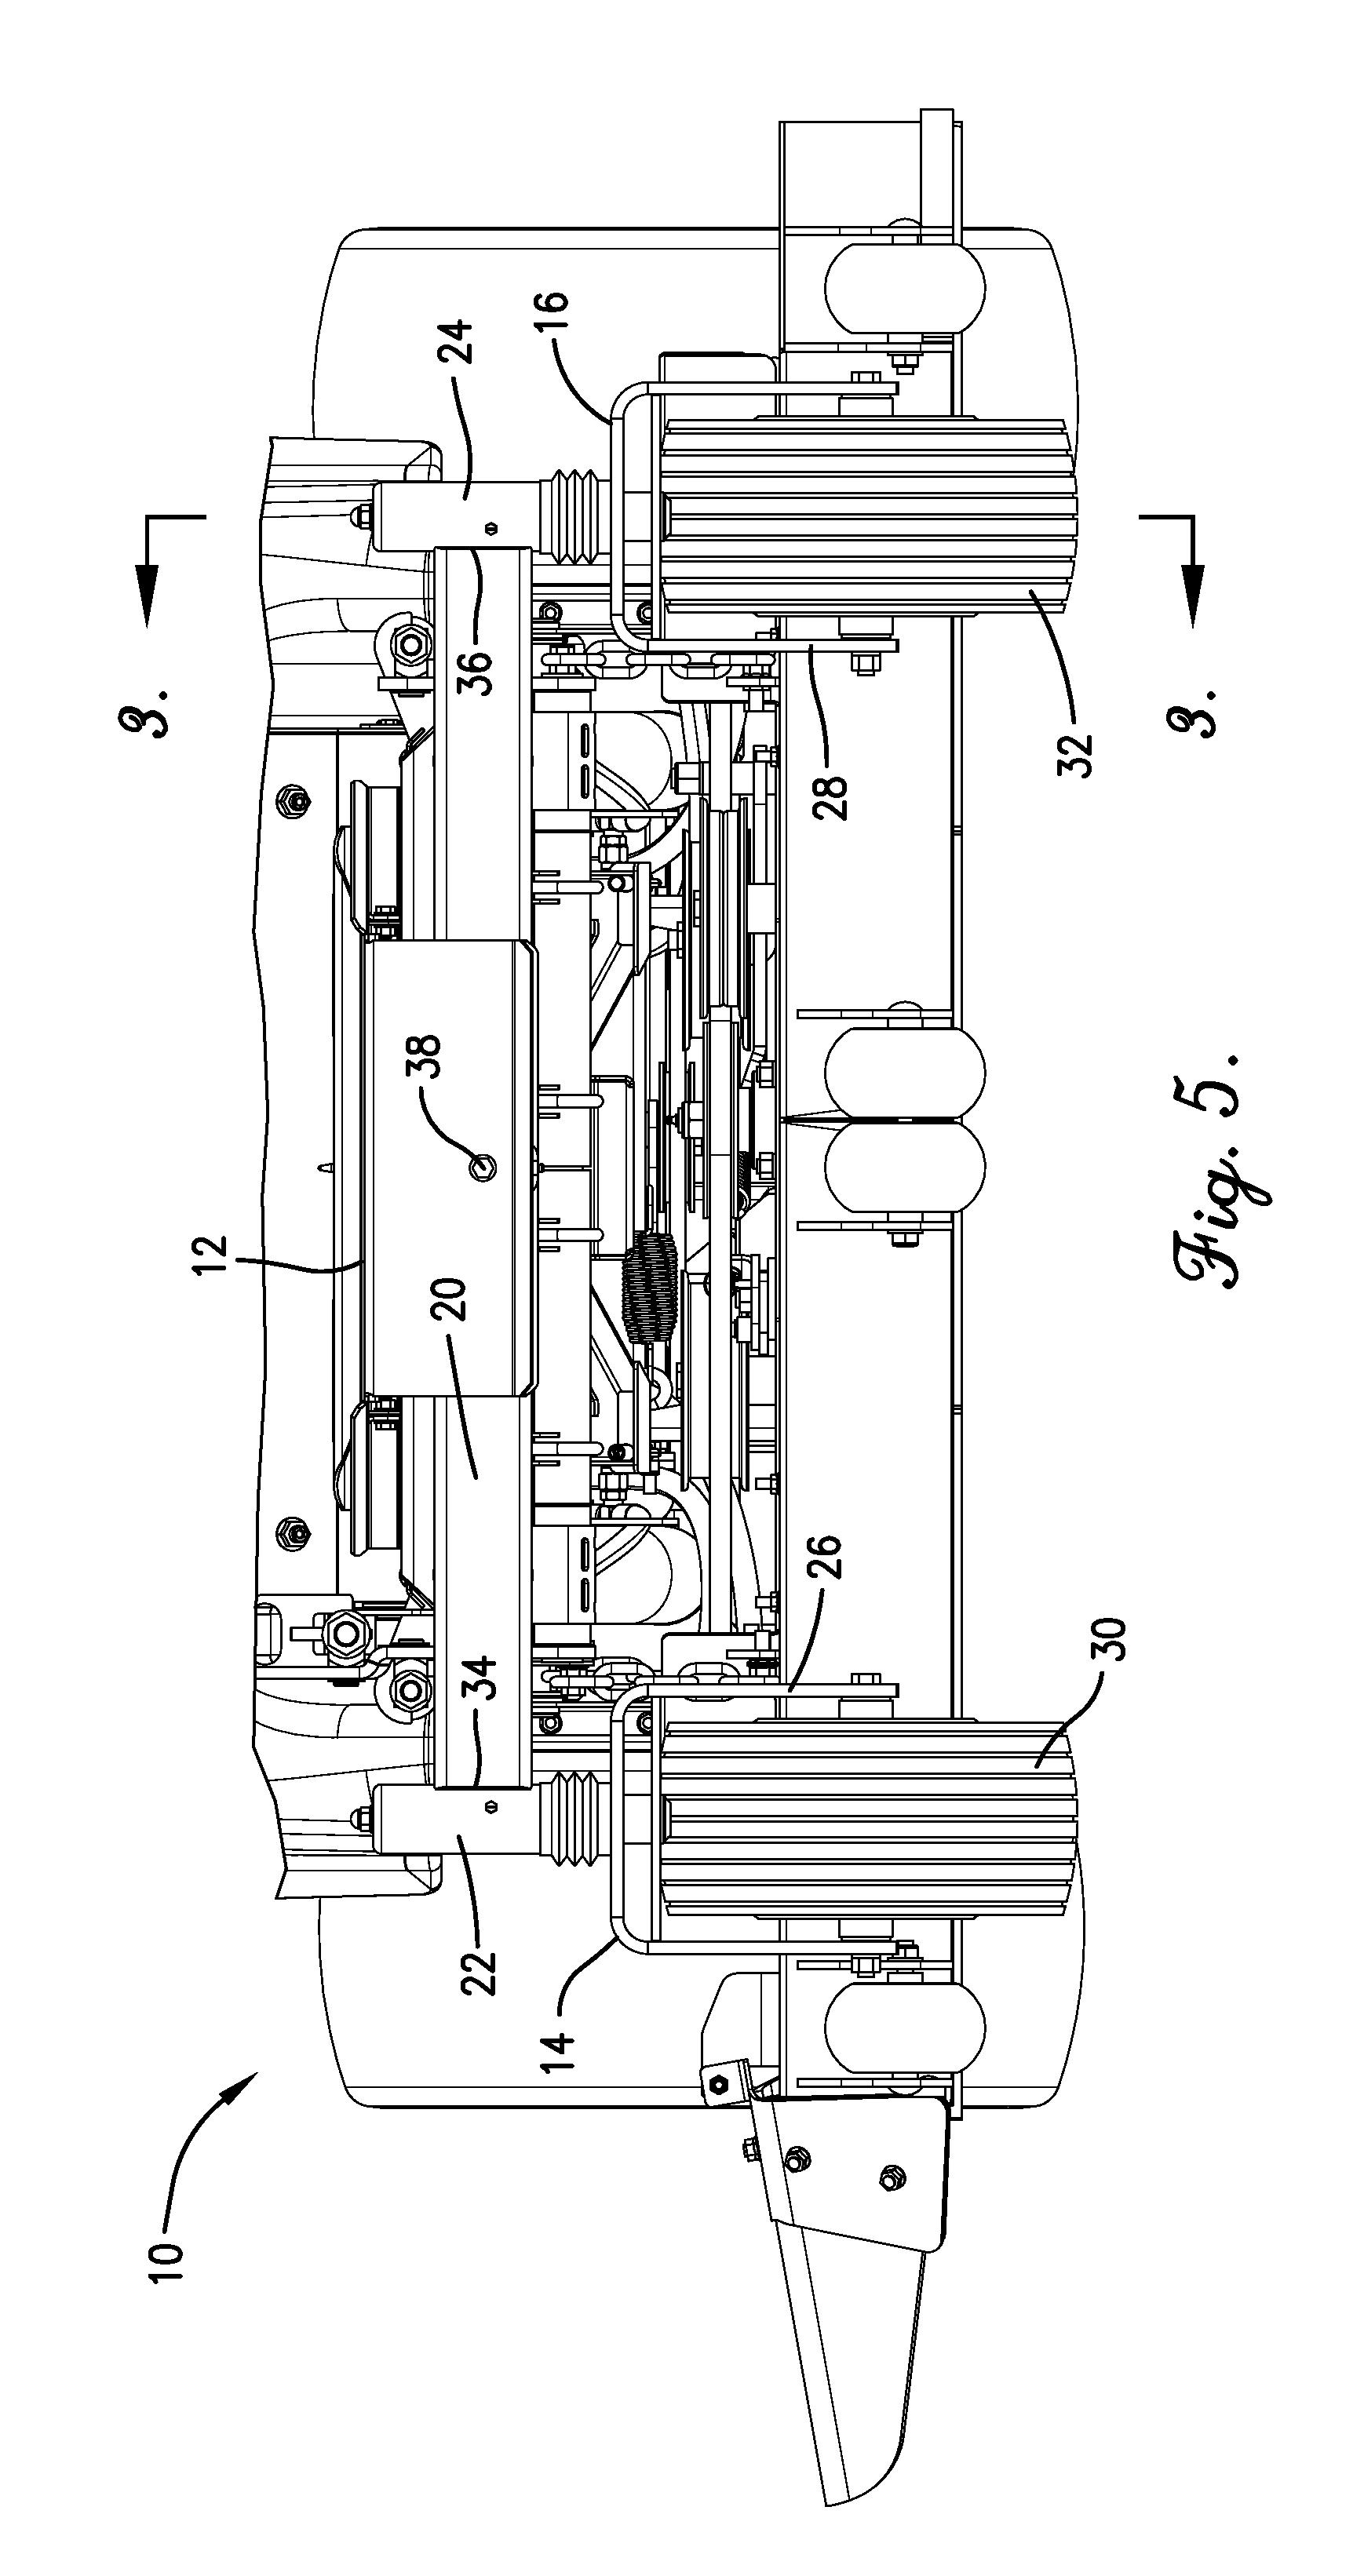 Fancy Car Engine Diagram Vignette - Diagram Wiring Ideas - ompib.info